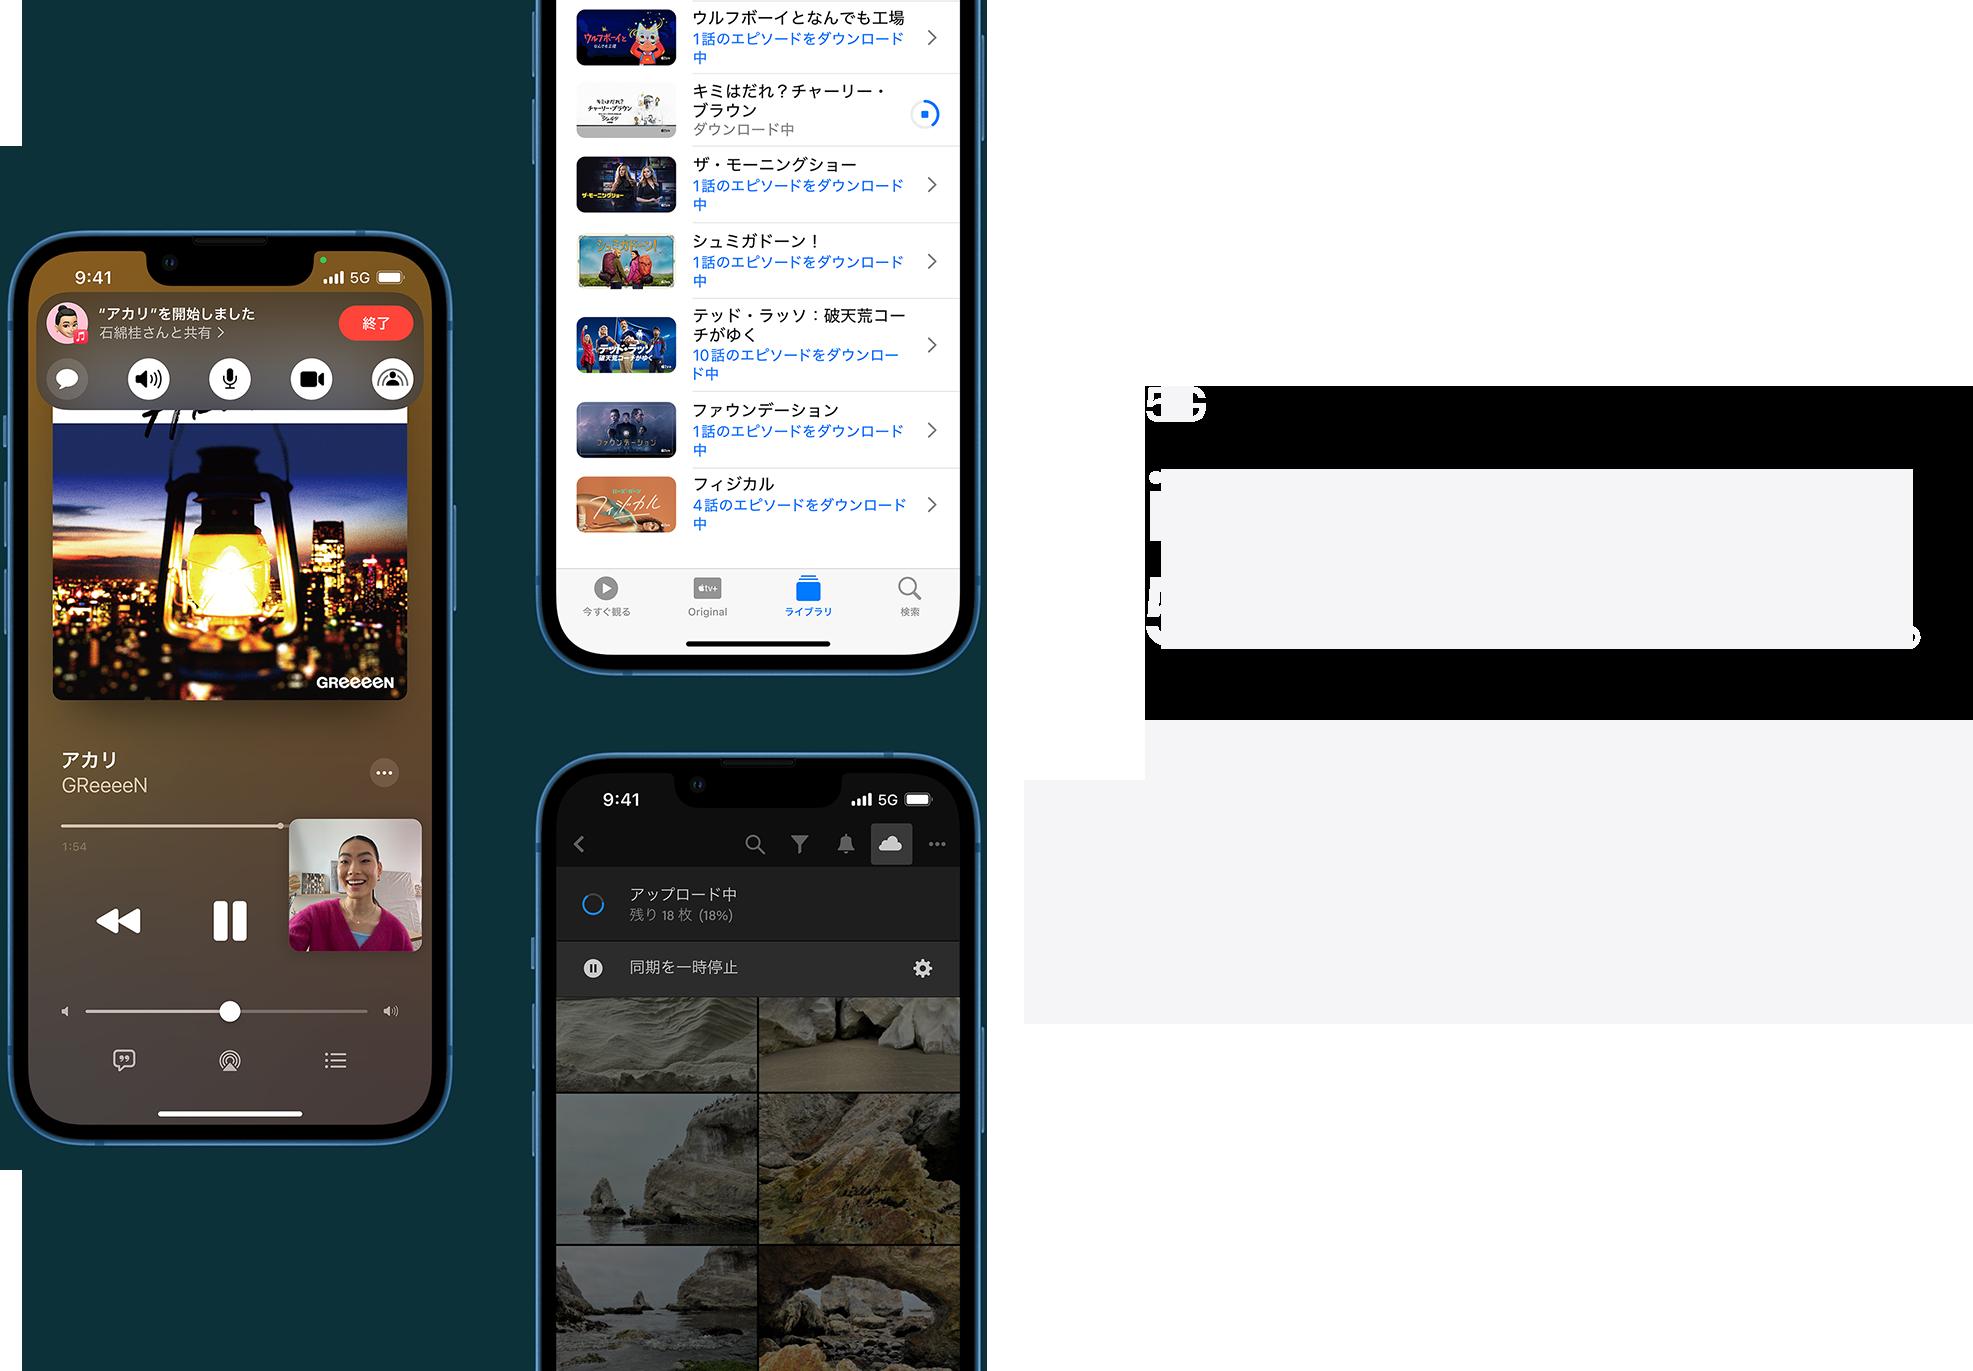 iphone13 5G